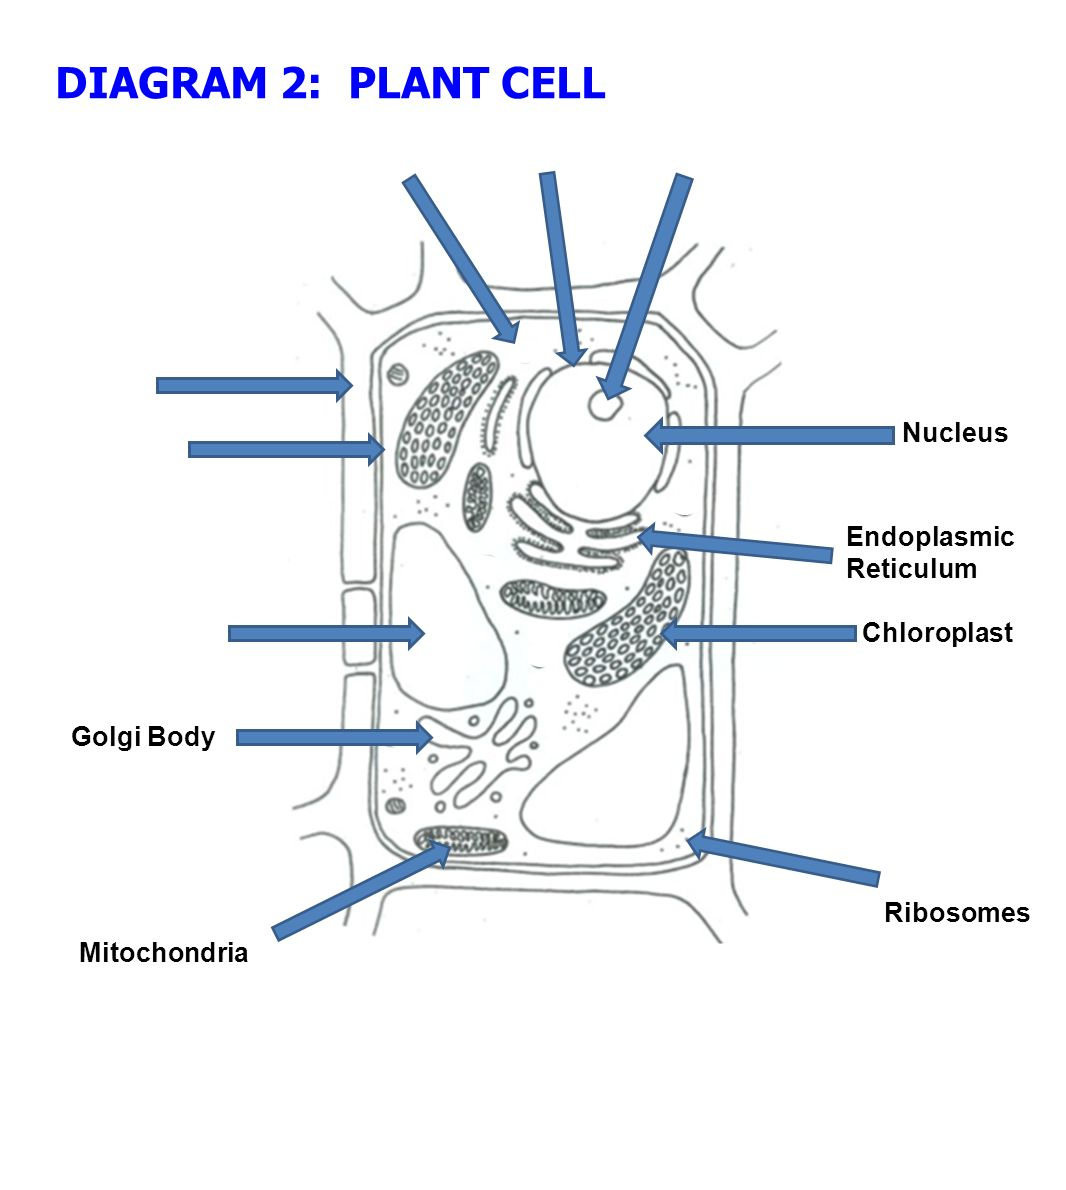 endoplasmic reticulum animal cell diagram gretsch wiring notes ppt download